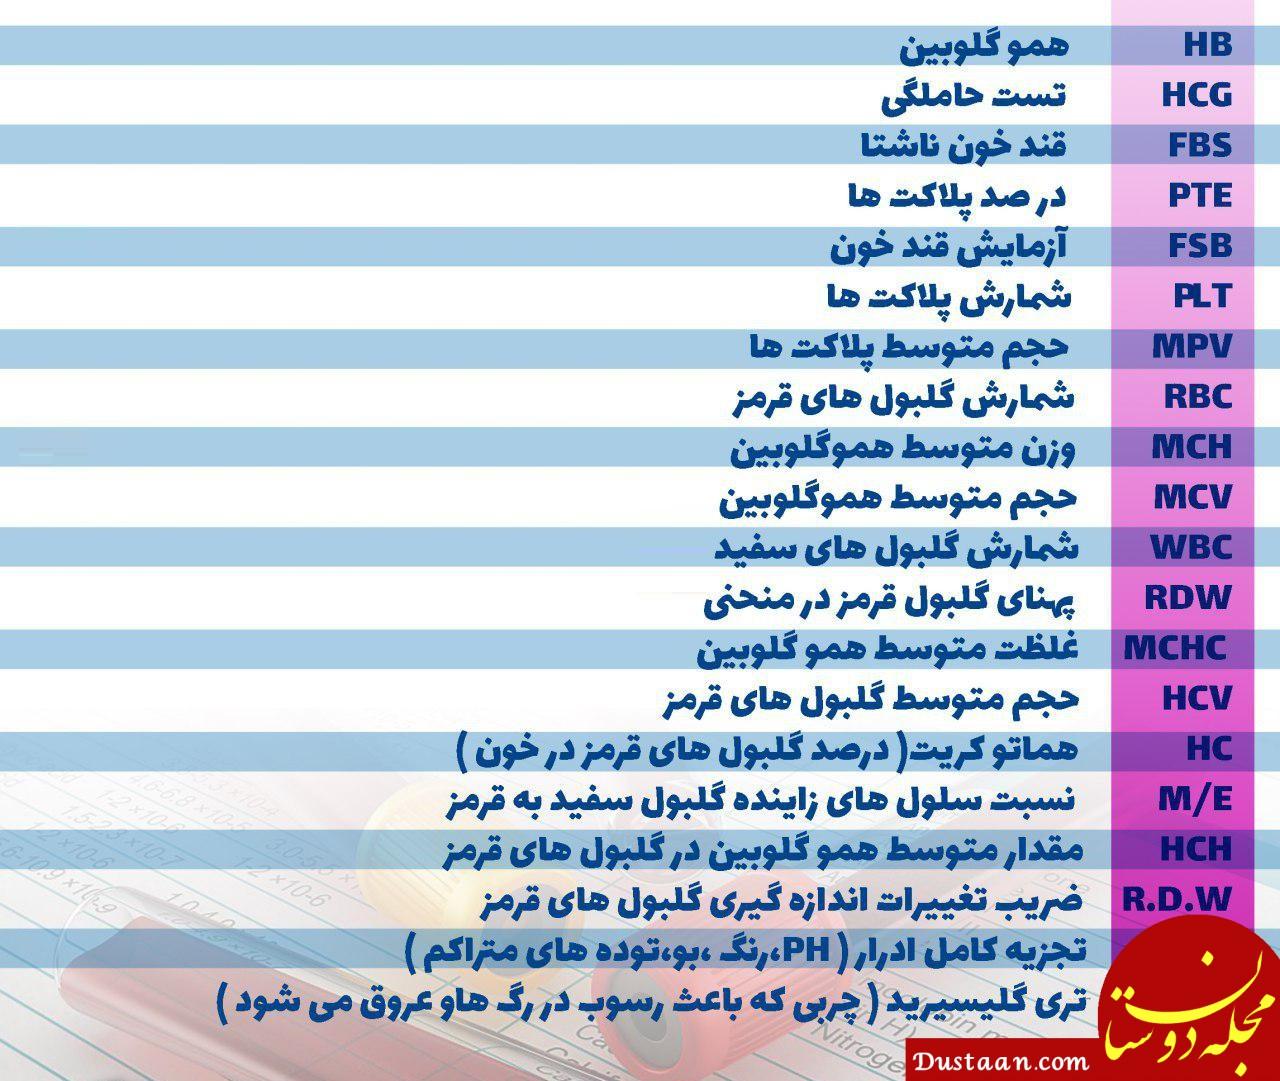 www.dustaan.com ترجمه حروف اختصاری در هر آزمایش خون